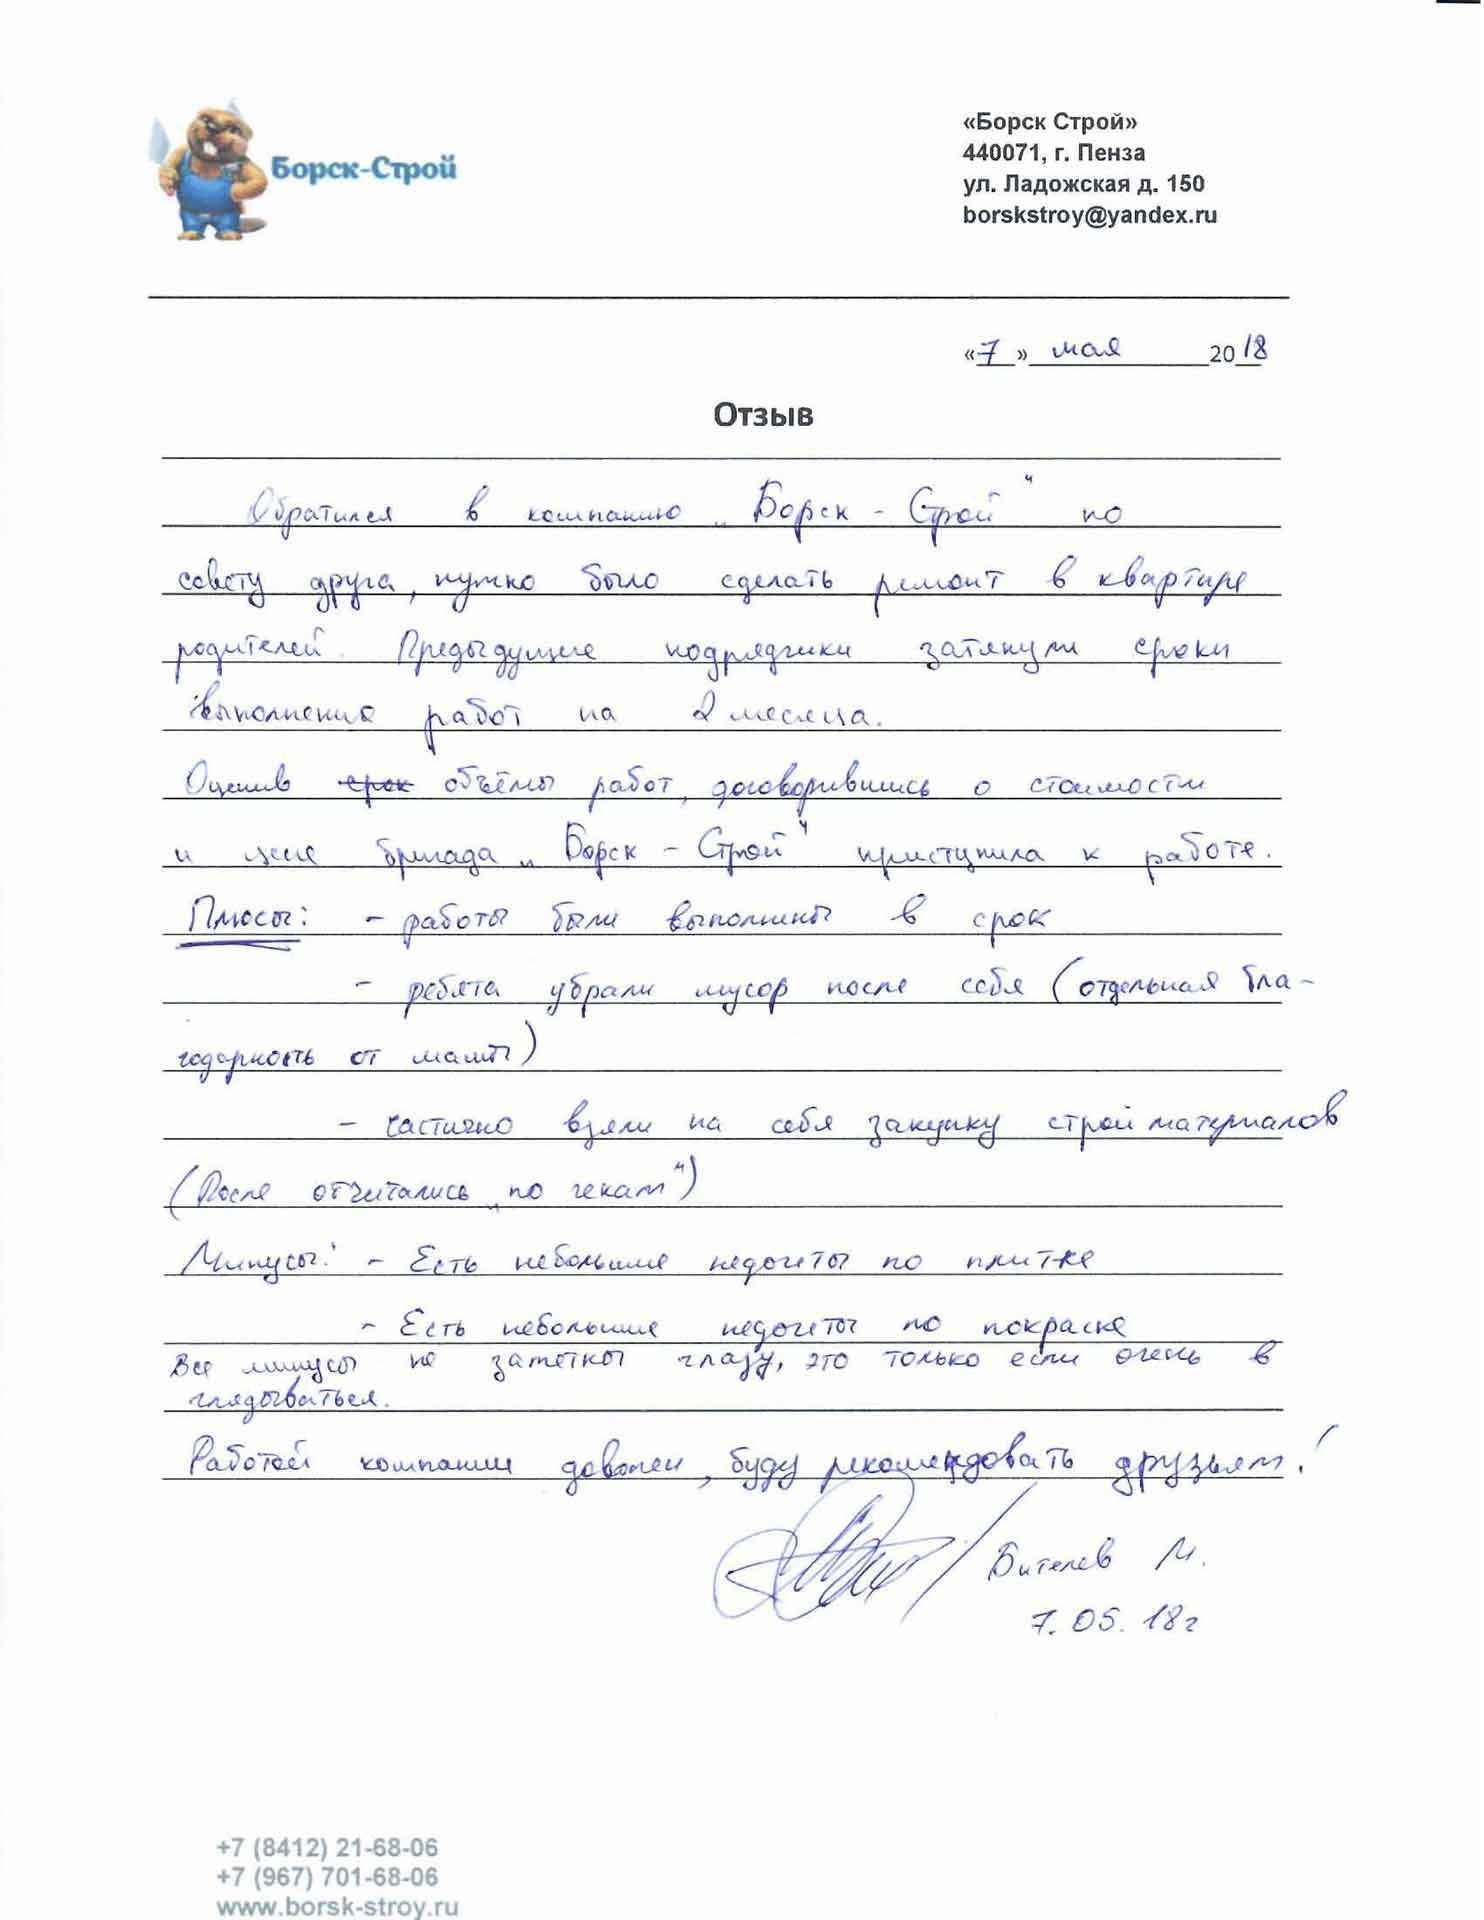 Максим Бителев